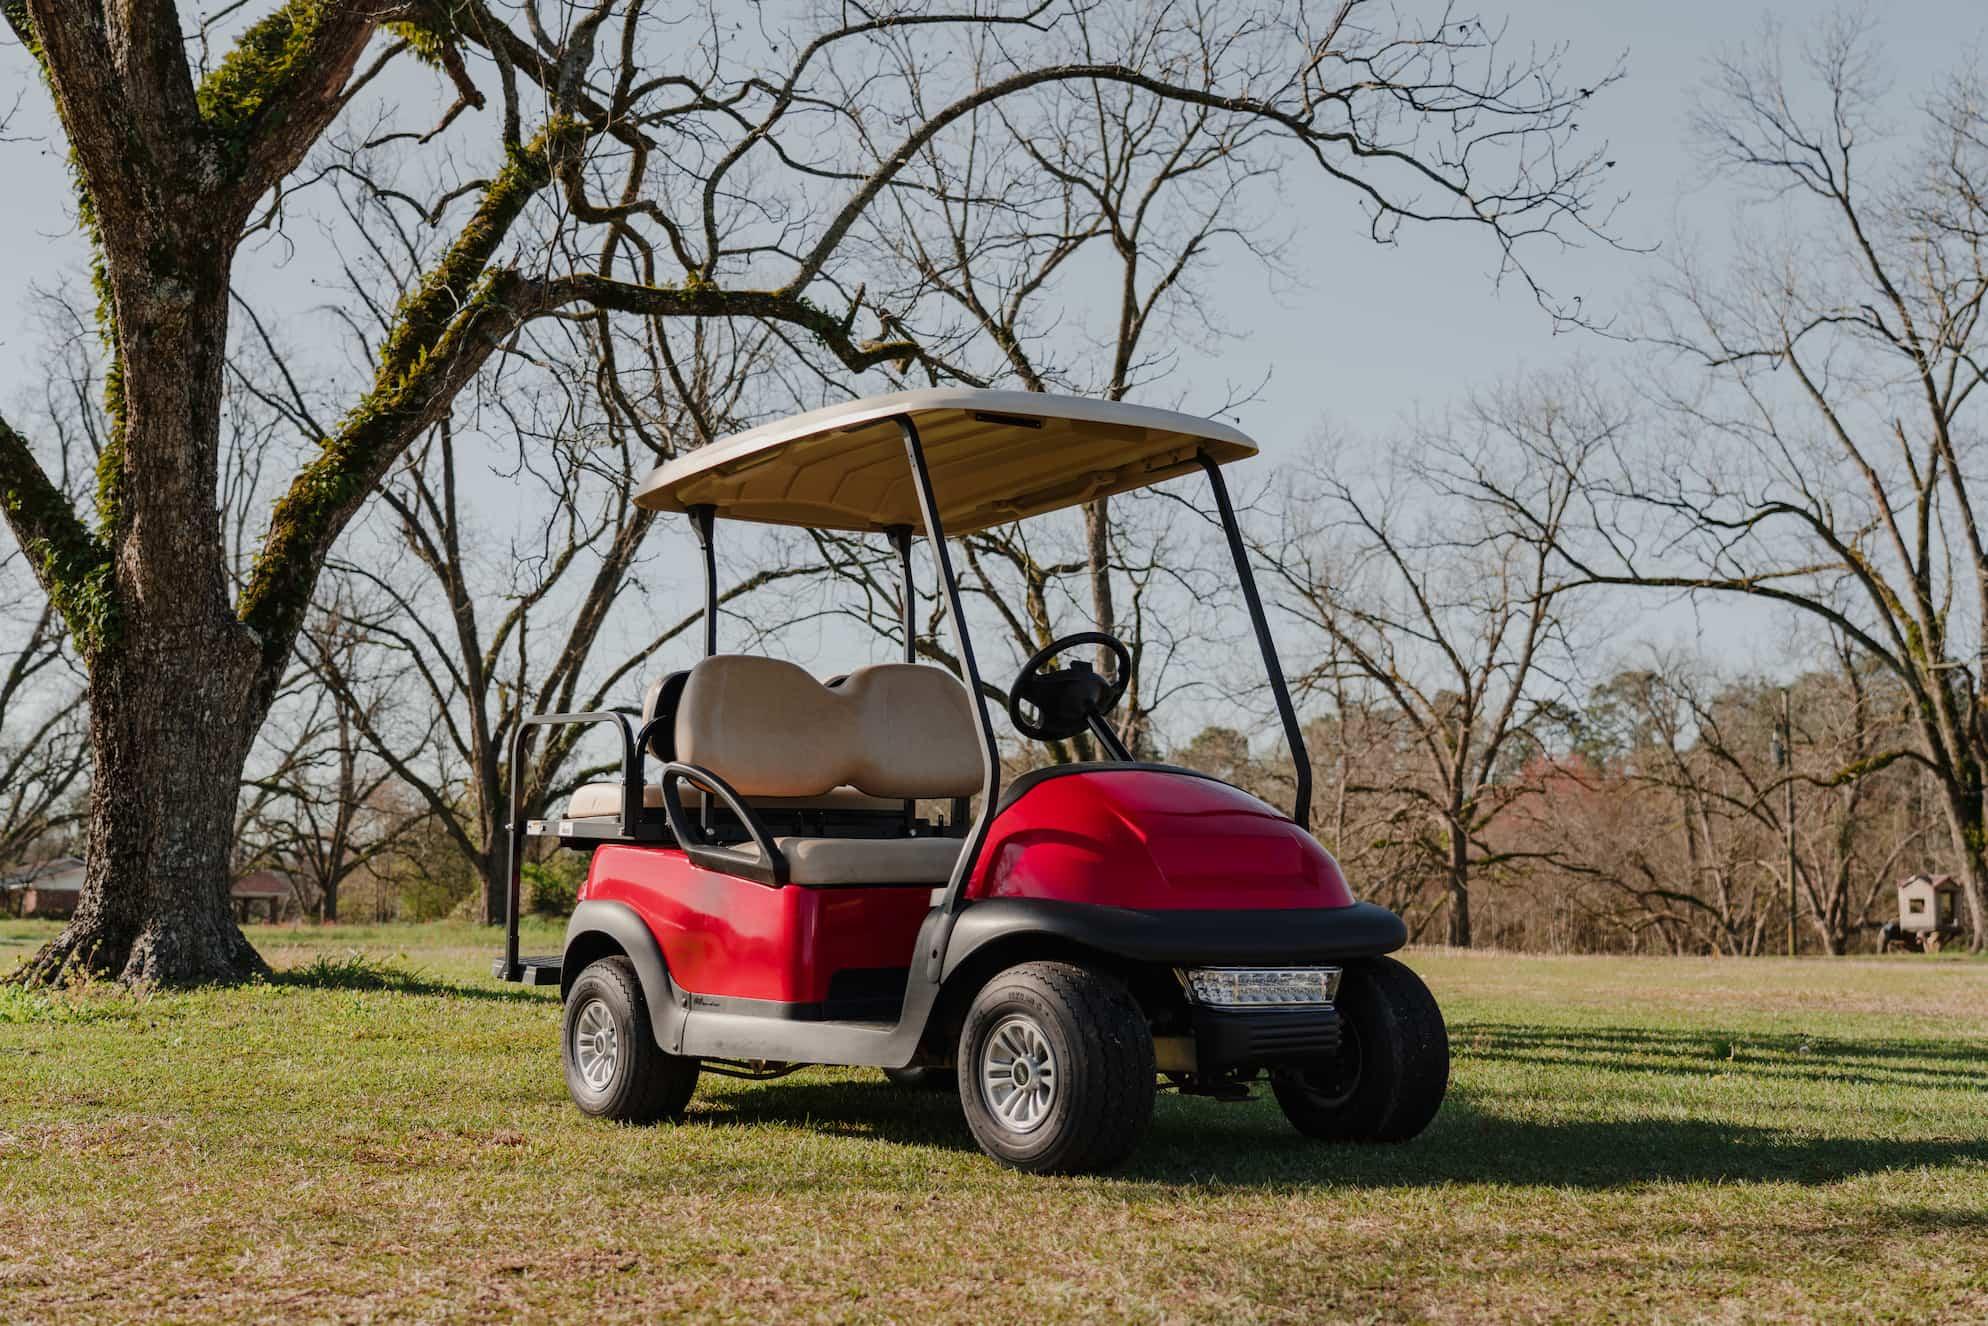 Red 4 seater golf cart in pecan orchard | Statesboro Golf Carts | New & Custom Golf Carts